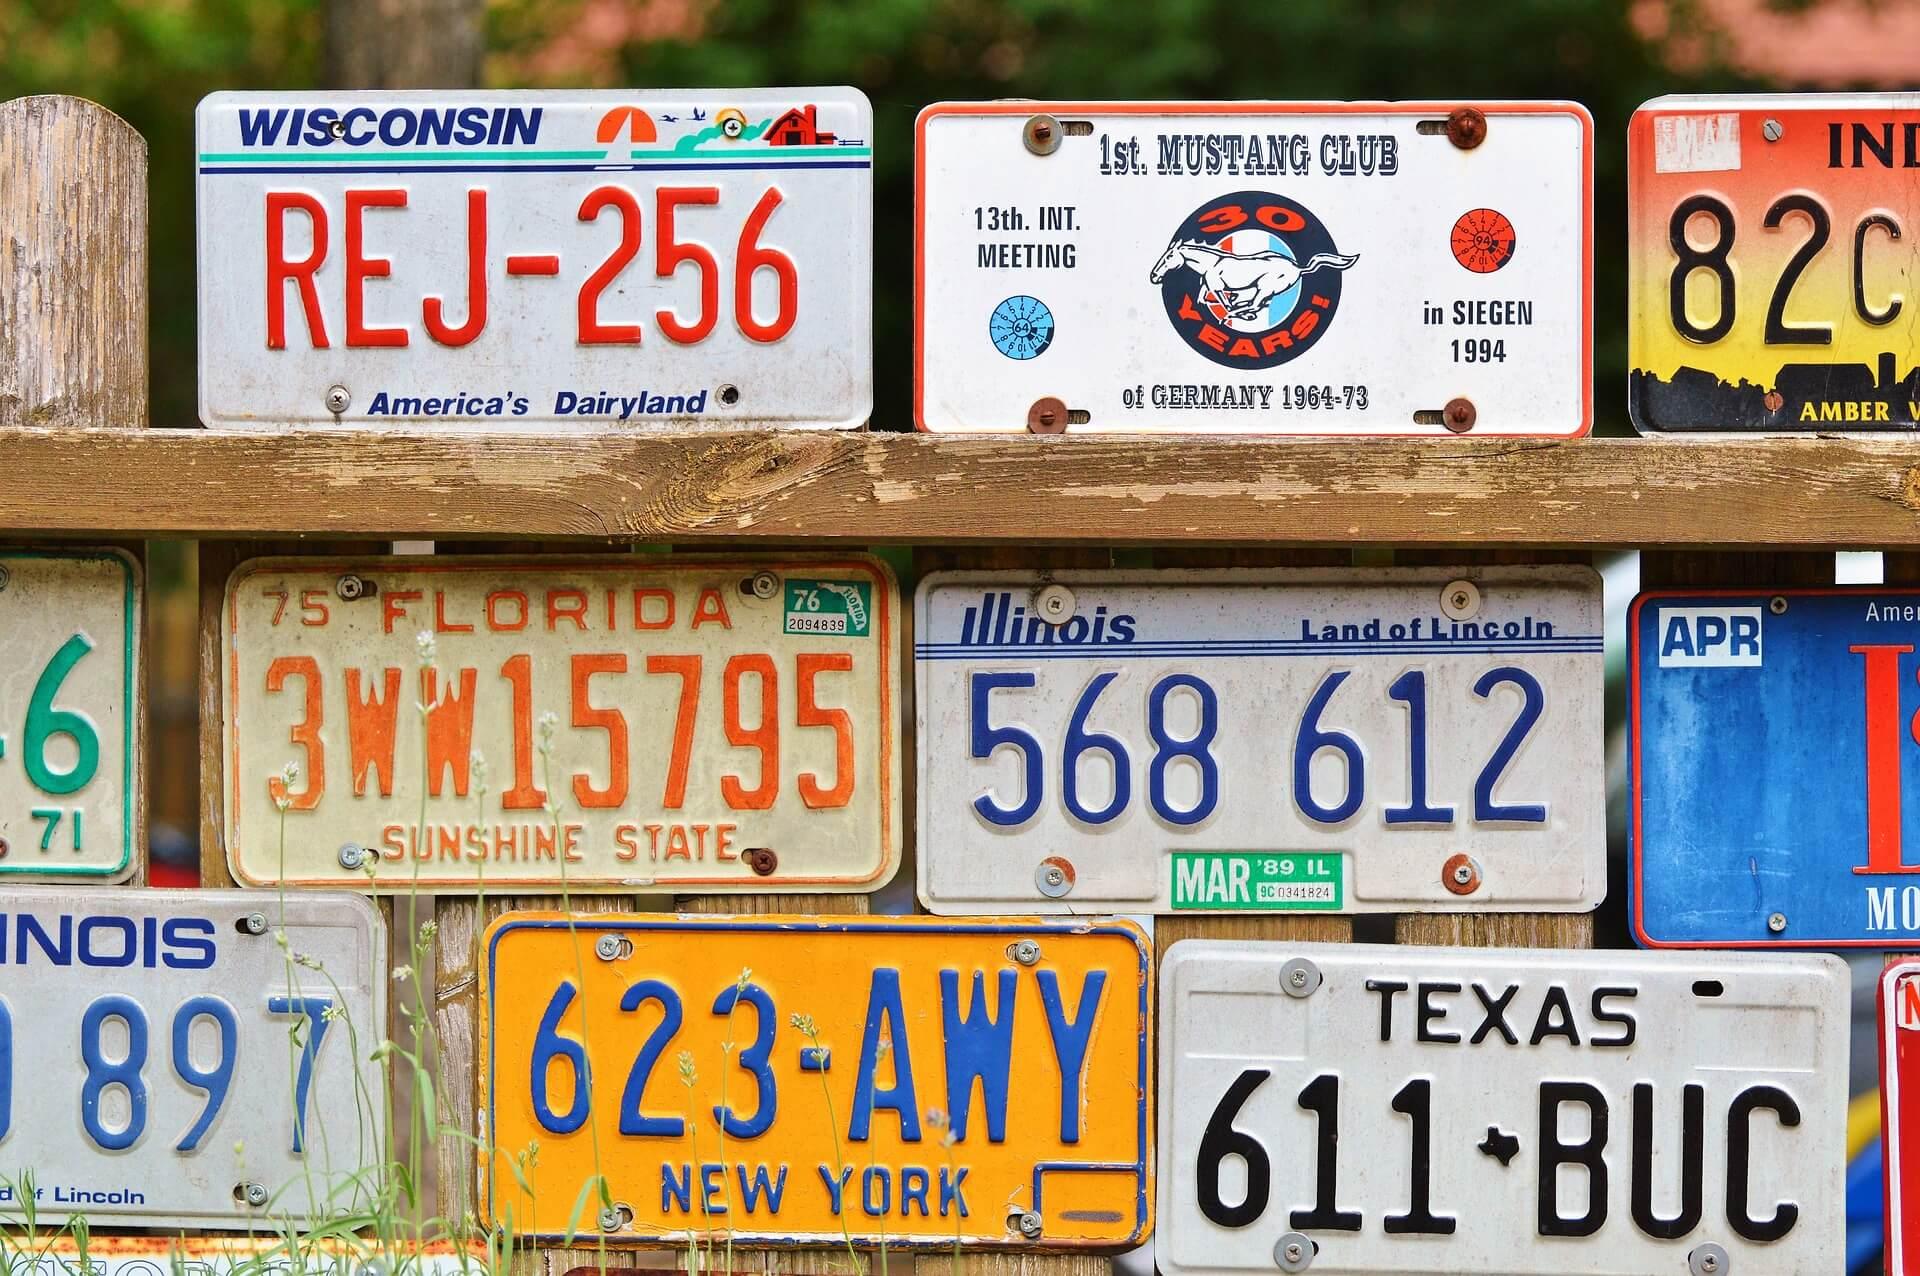 License Plate Reader On Windows